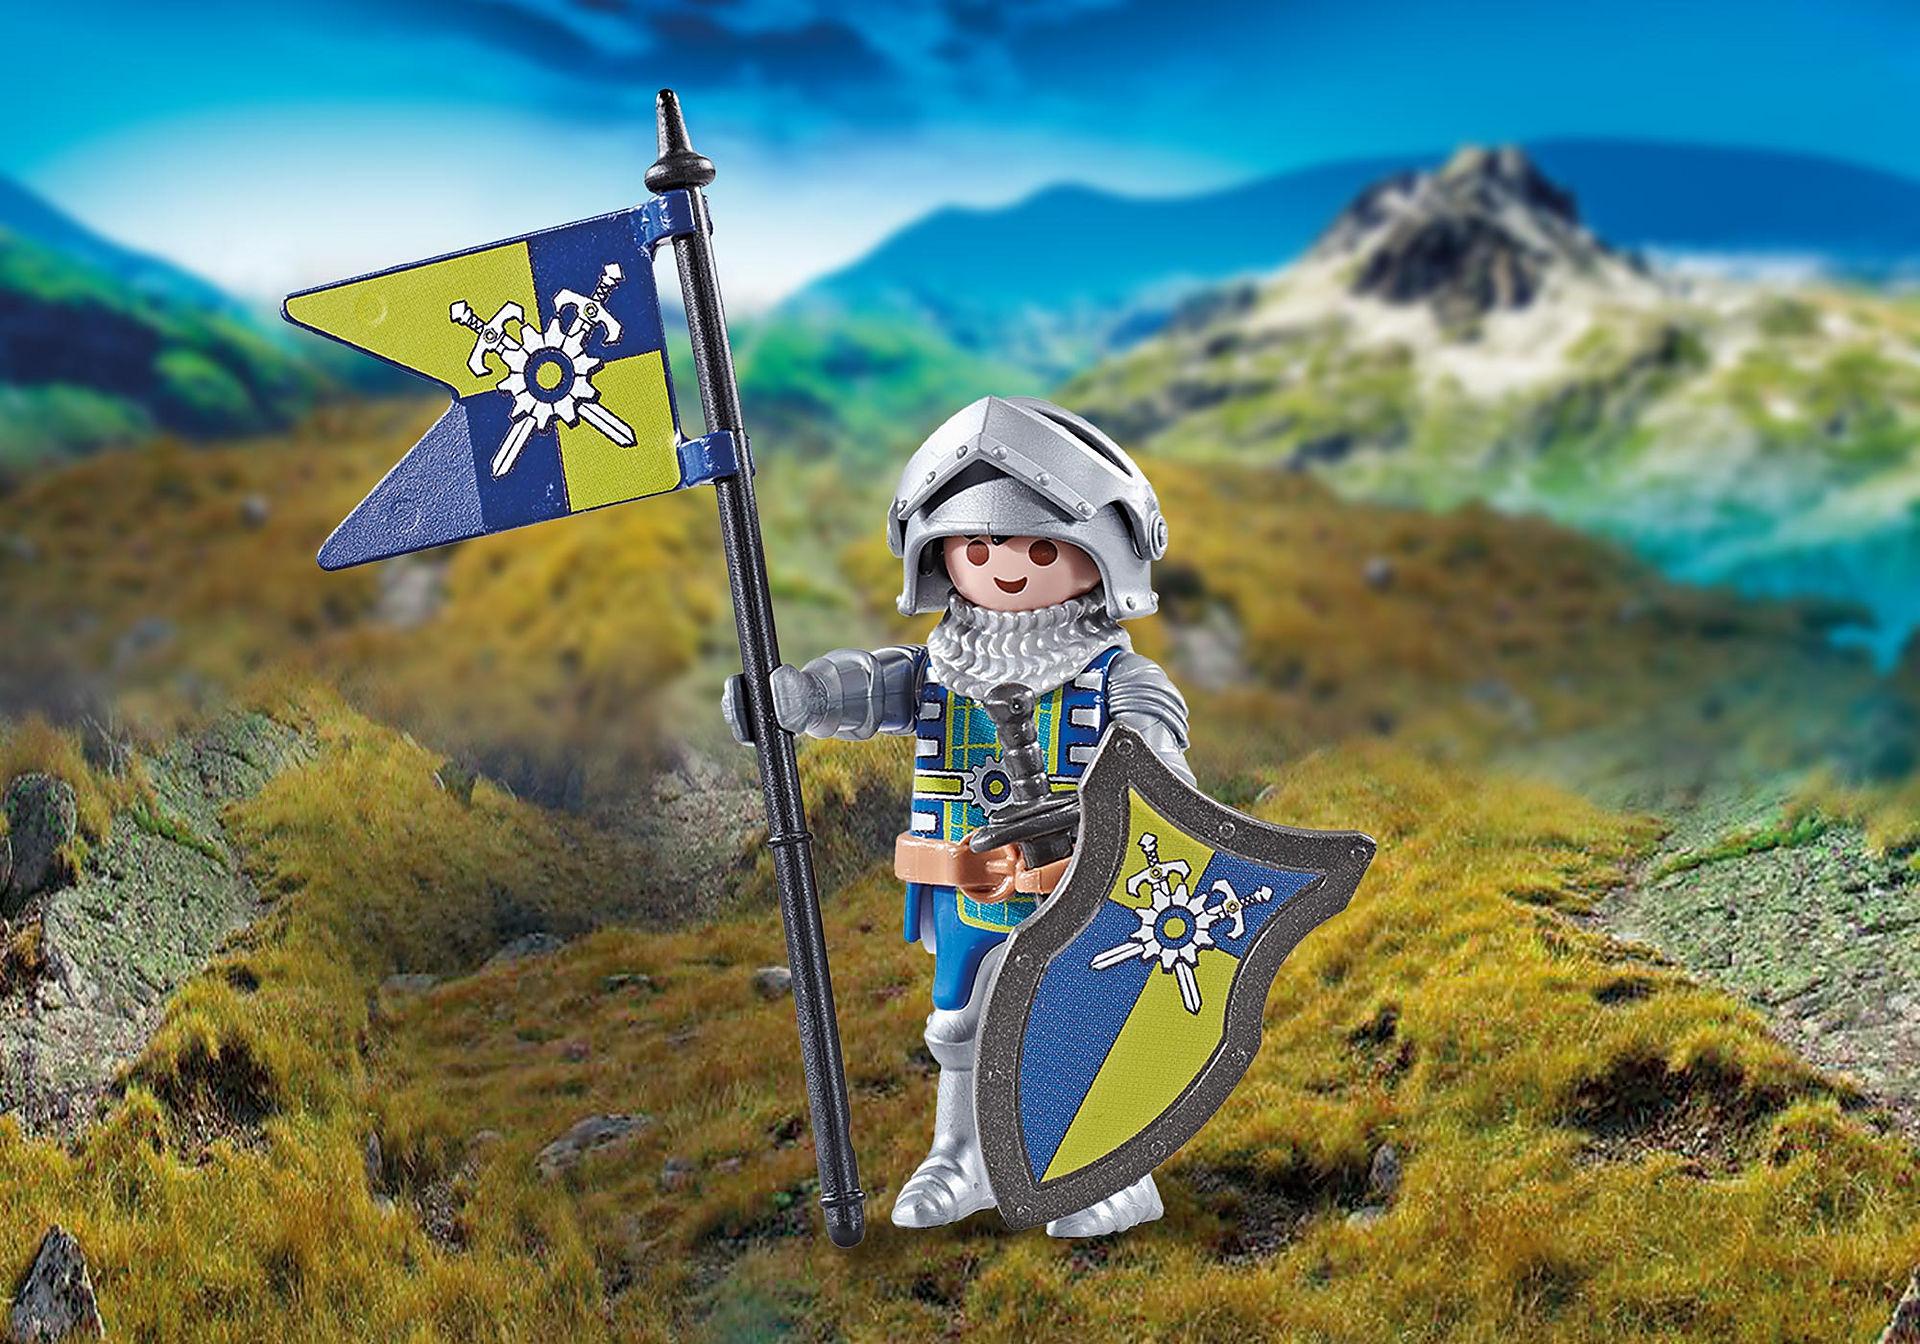 9835 Capitano dei Cavalieri di Novelmore zoom image1